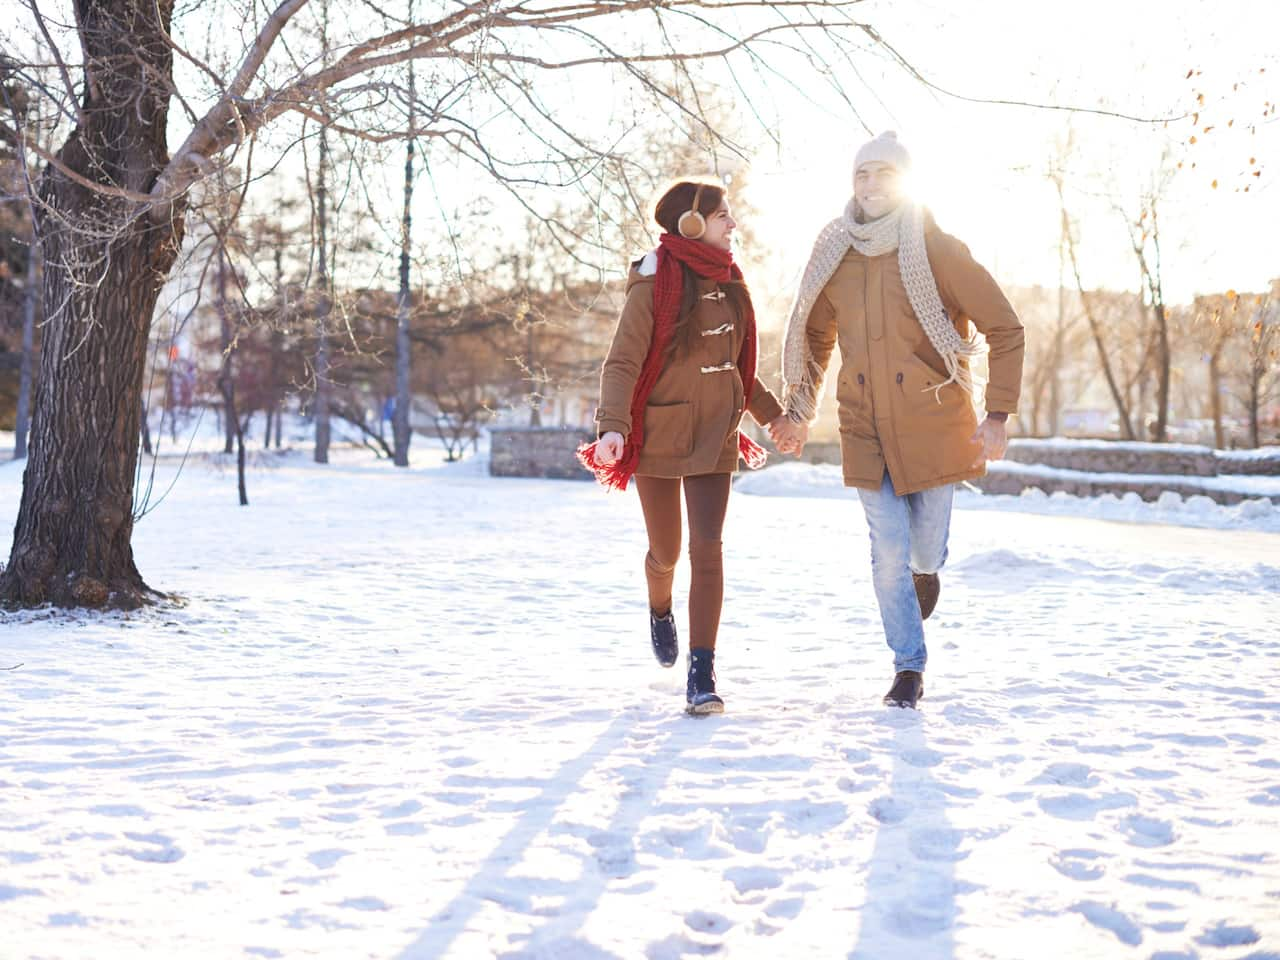 Couple running through snow